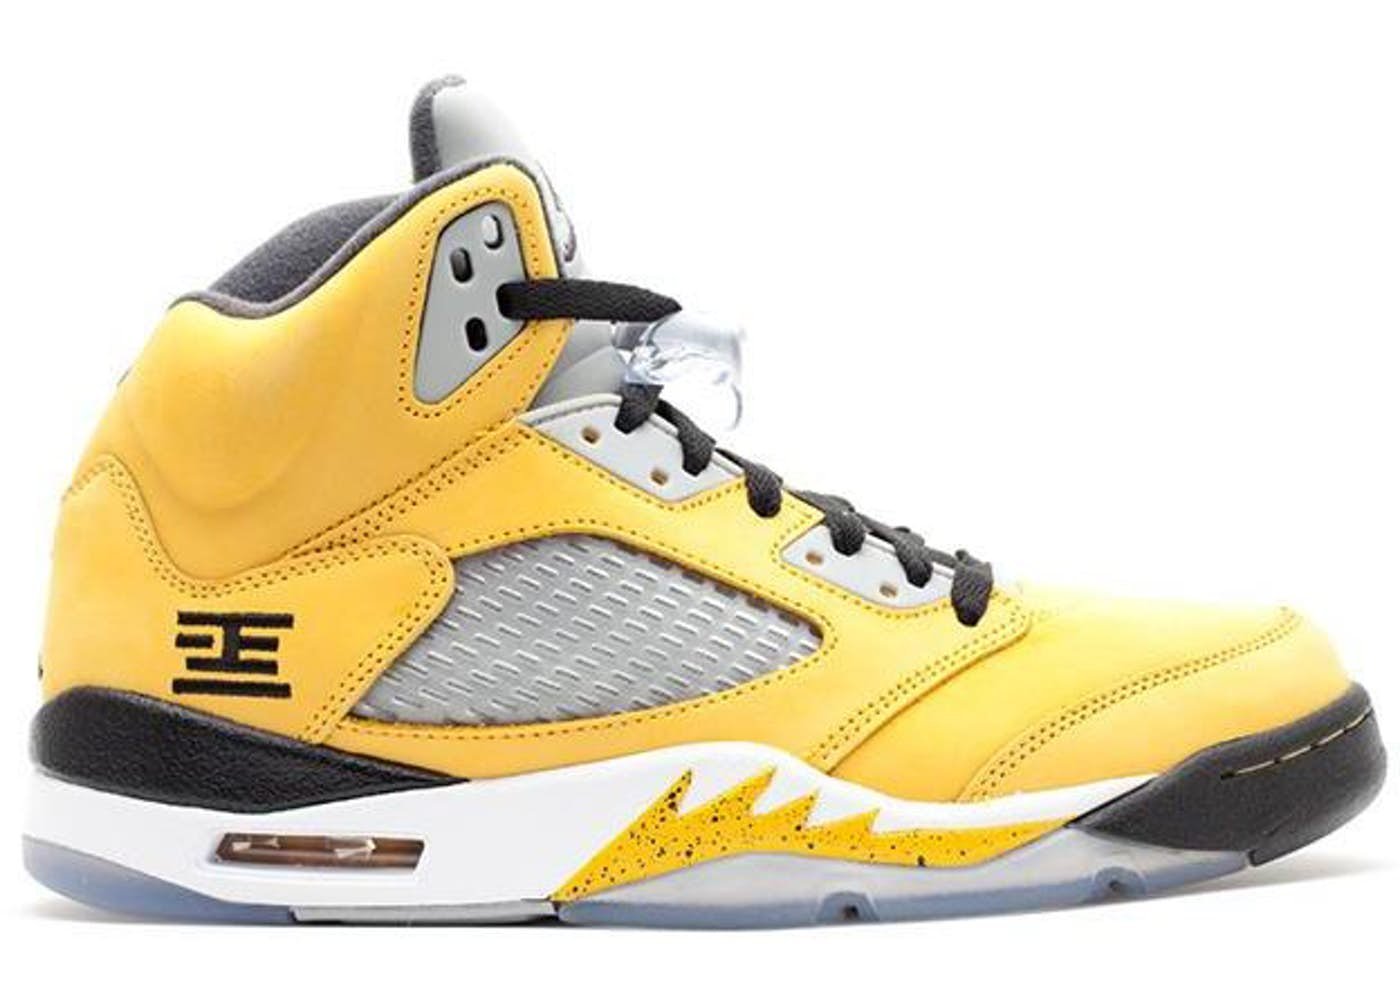 Air Jordan Golf Shoes Size